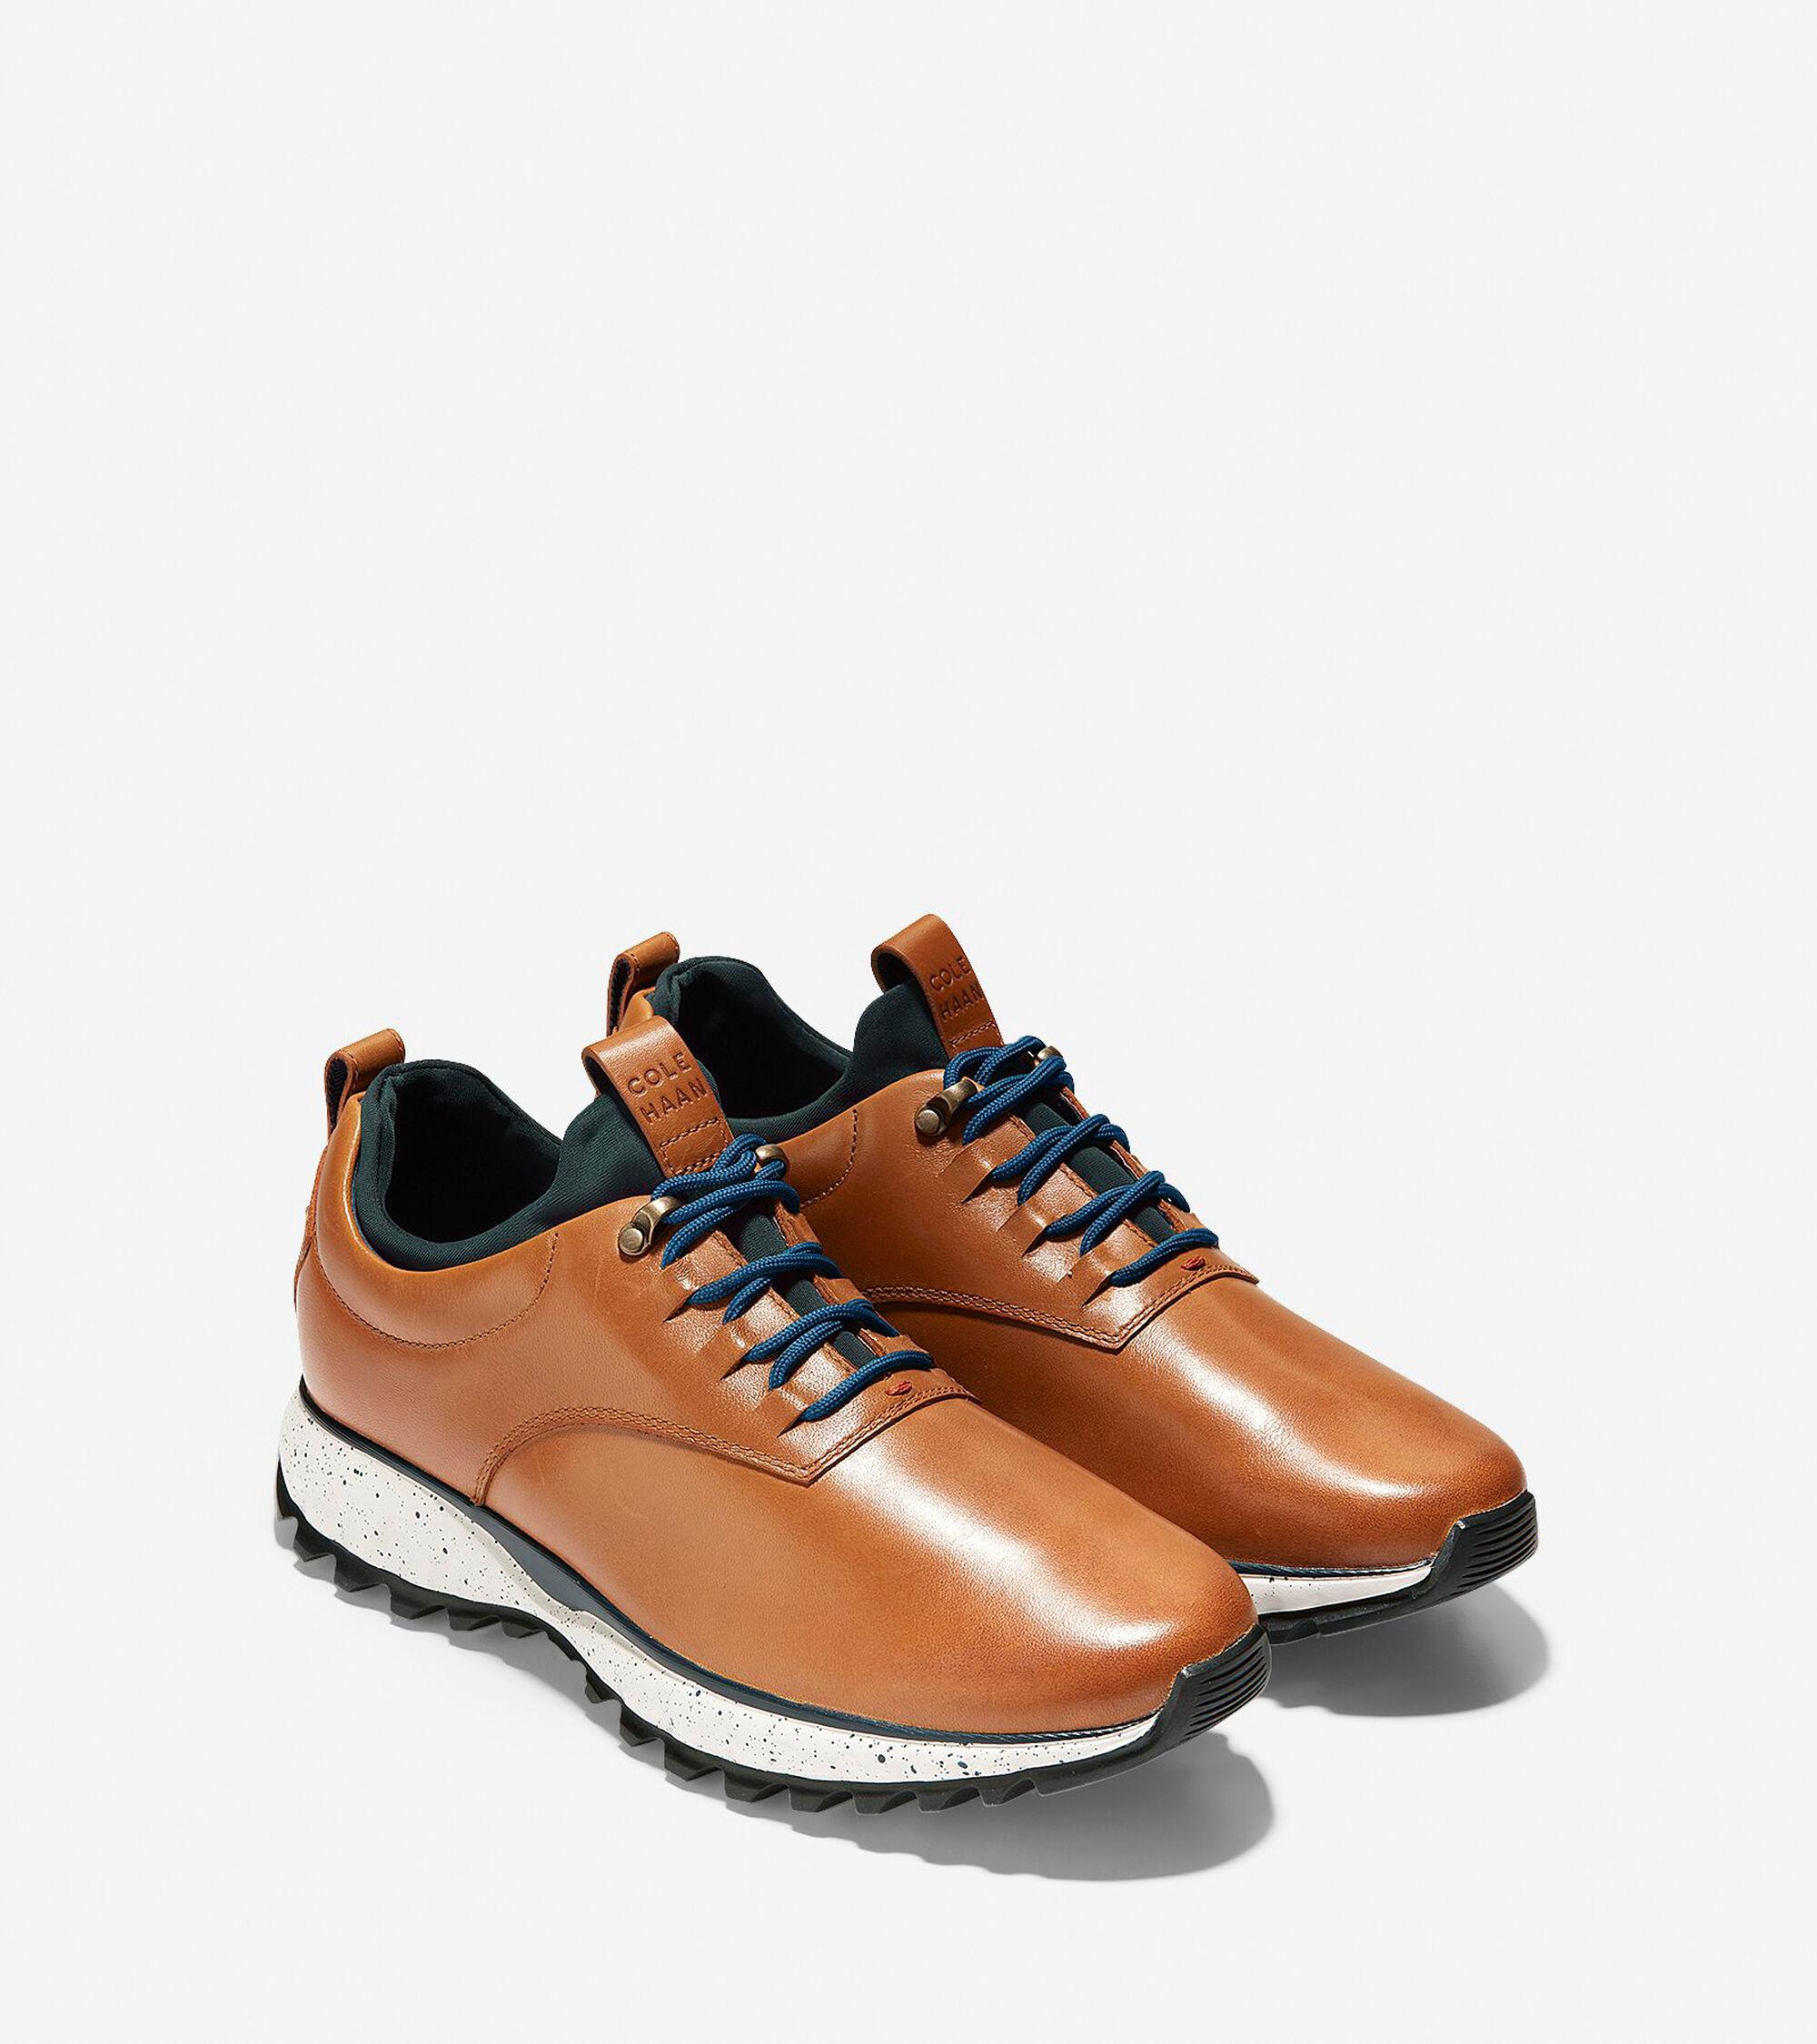 df38e369ca22 ... Men s ZERØGRAND All-Terrain Waterproof Sneaker  Men s ZERØGRAND  All-Terrain Waterproof Sneaker.  COLEHAAN